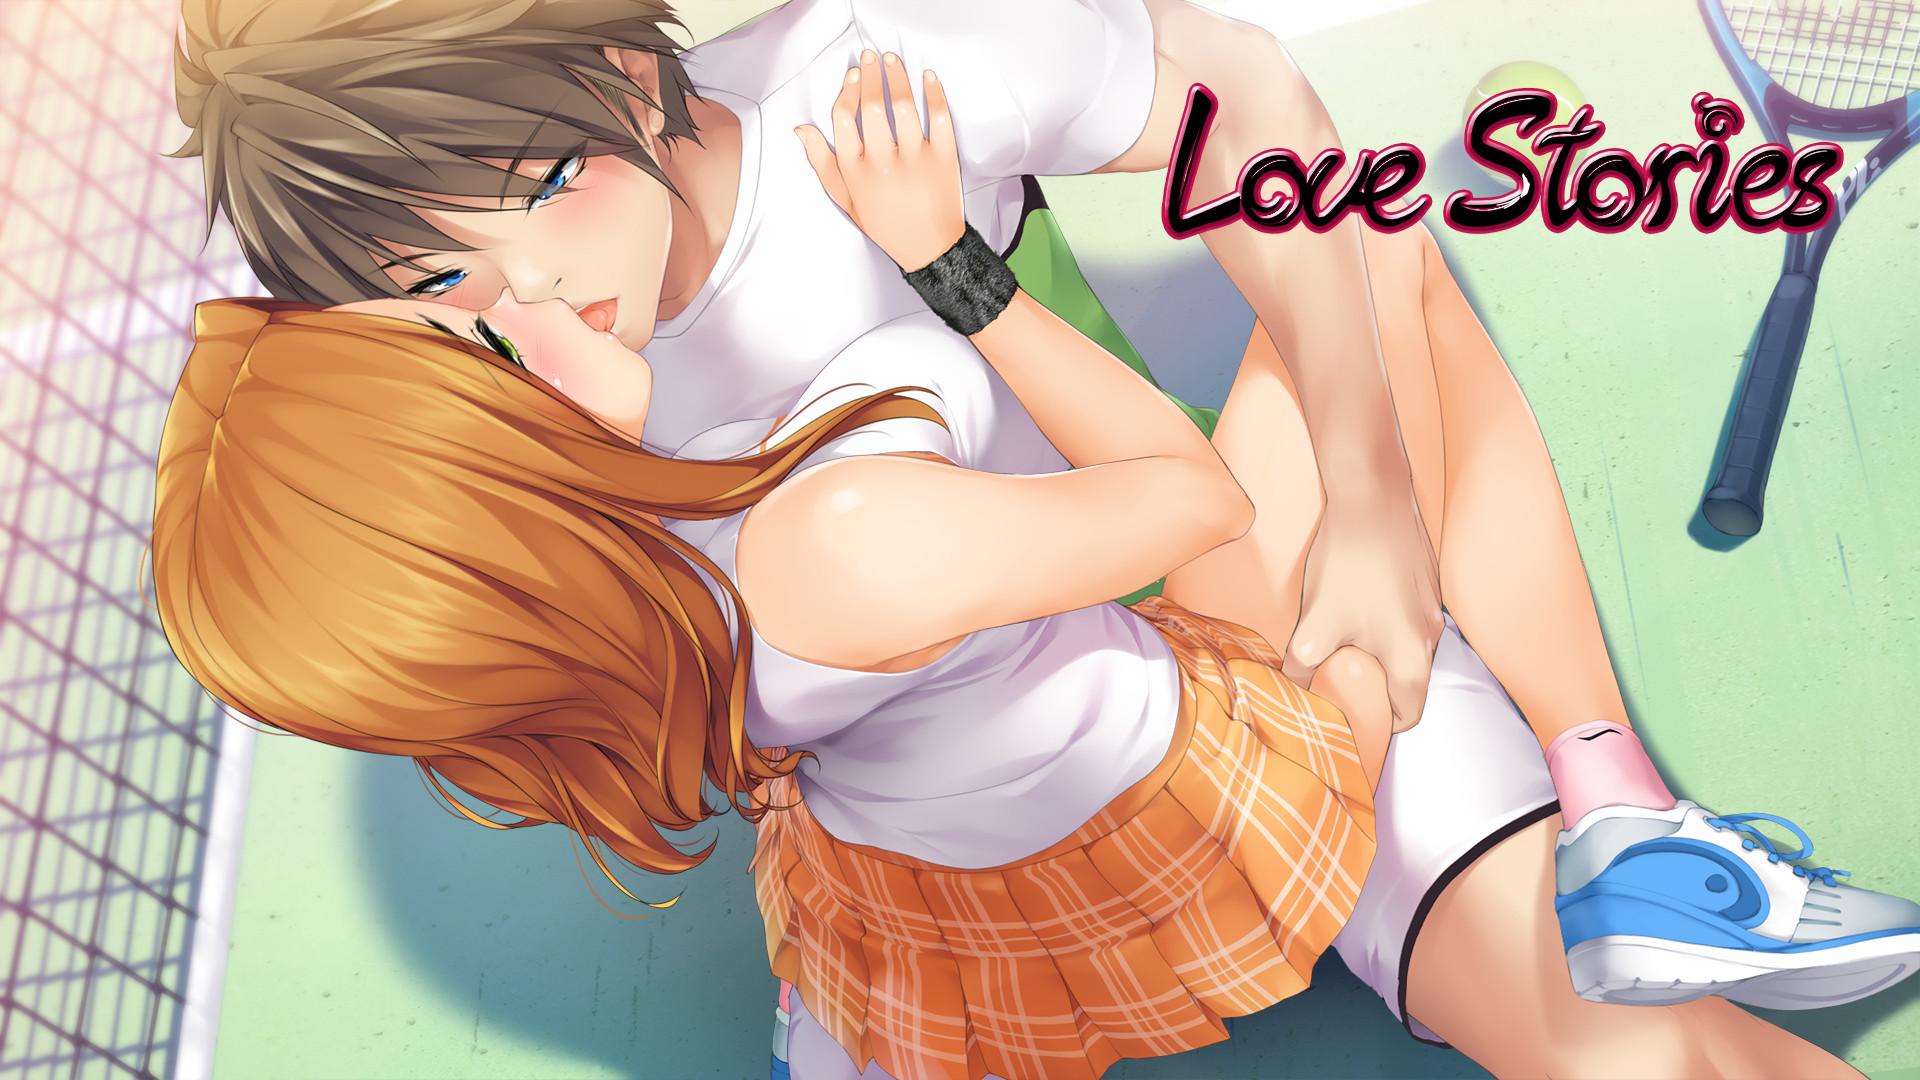 Free sex love stories